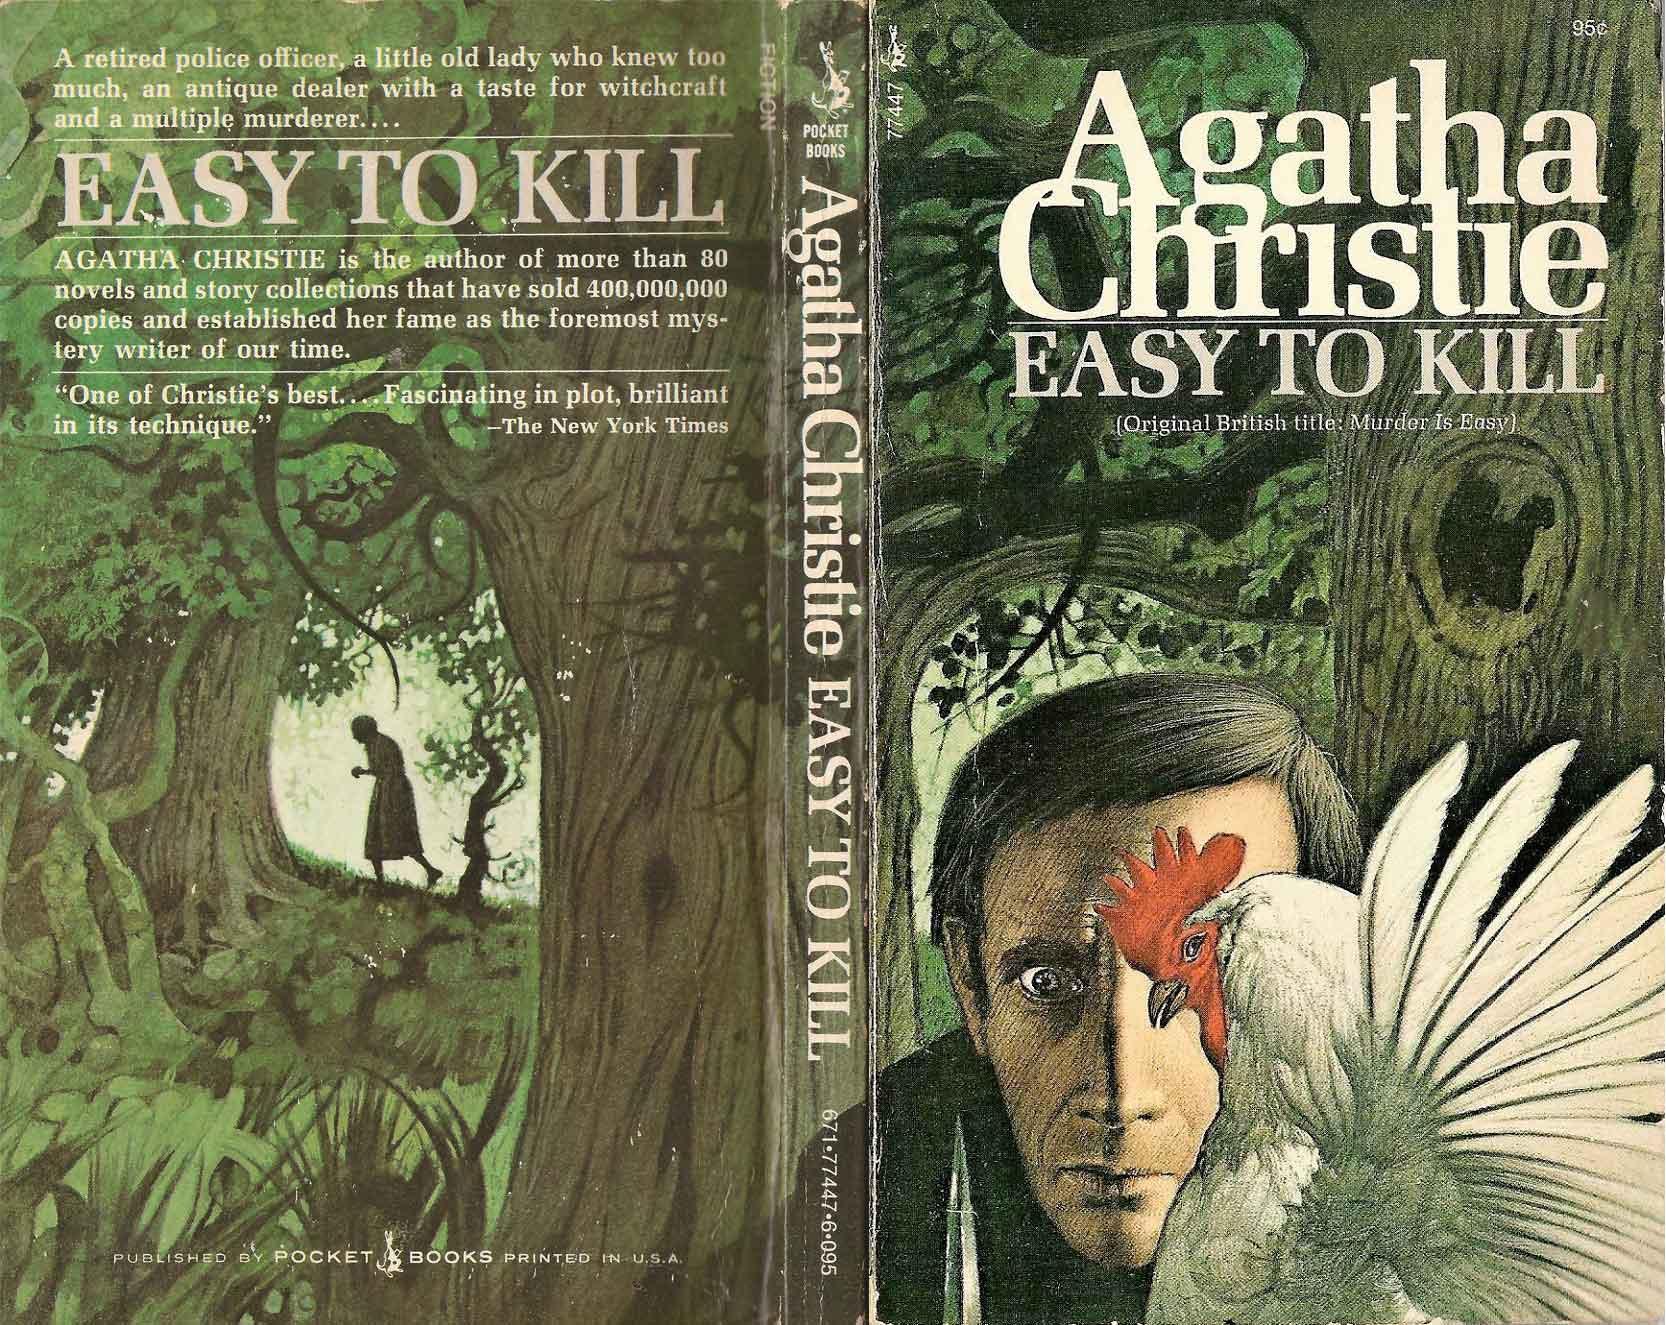 Agatha Christie Tom Adams Easy to Kill Pocket fixed sm